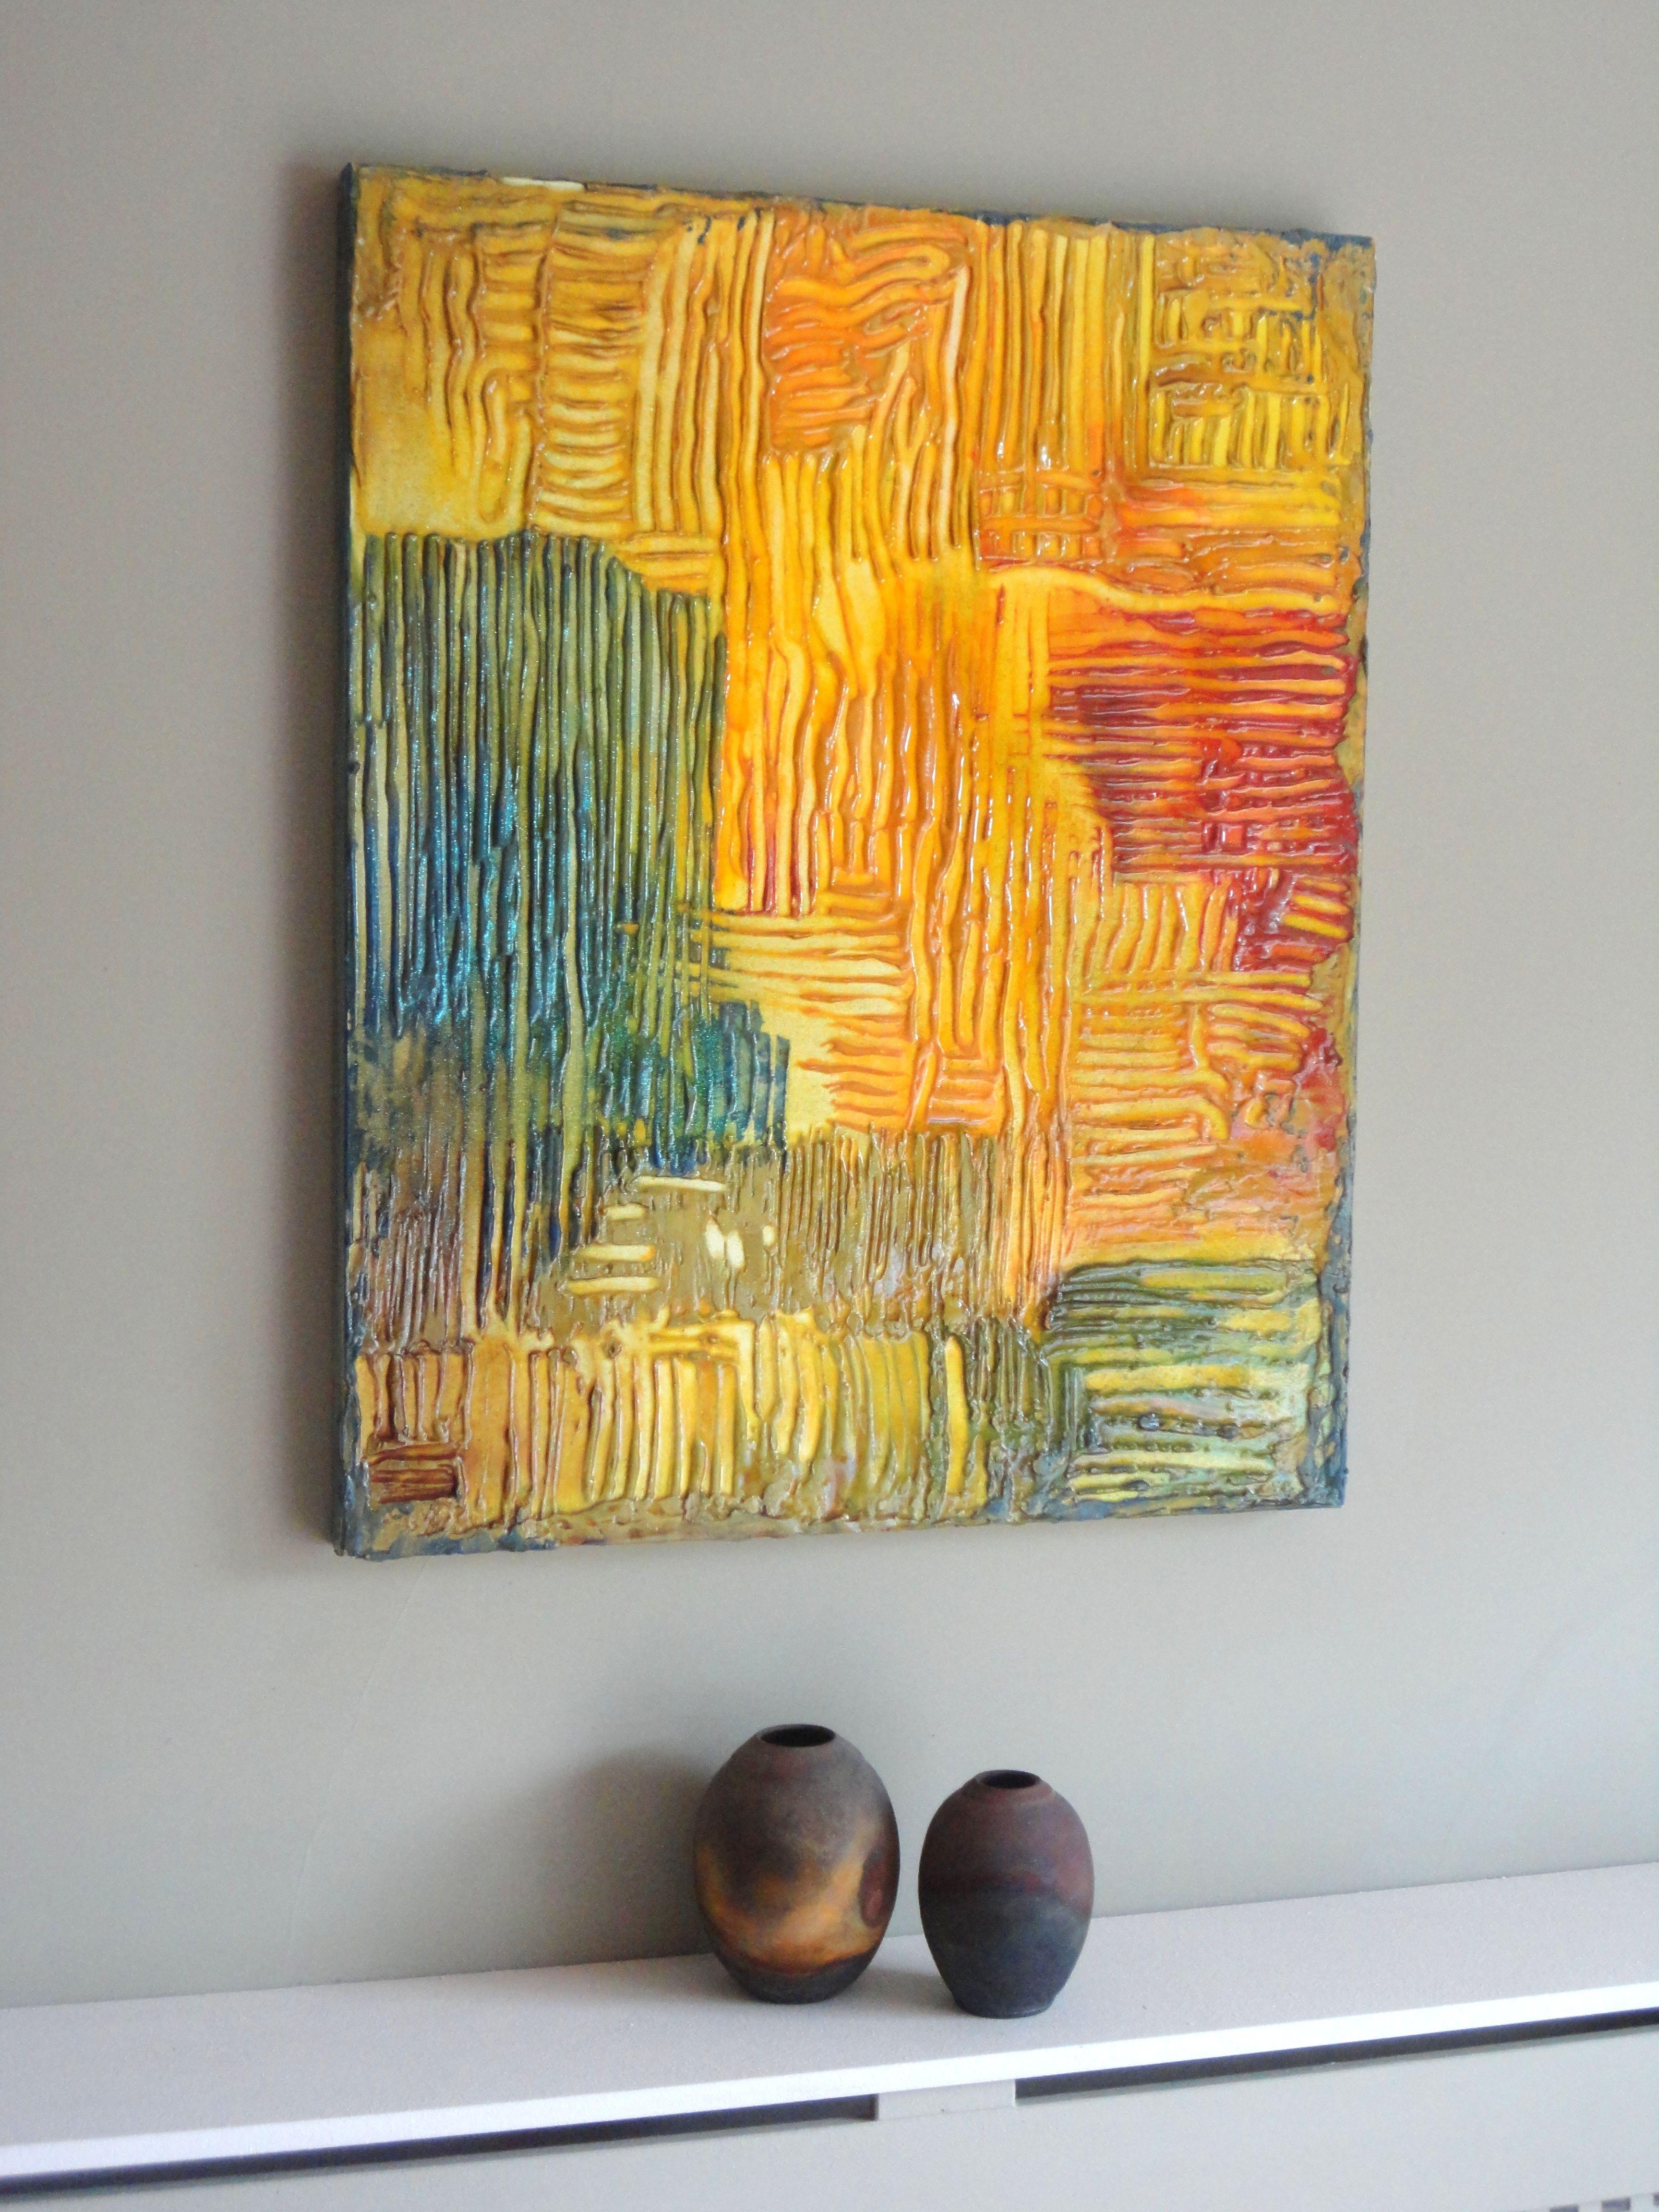 Abstract Art by Paul Mason | Cuadros | Pinterest | Paintings, Modern ...